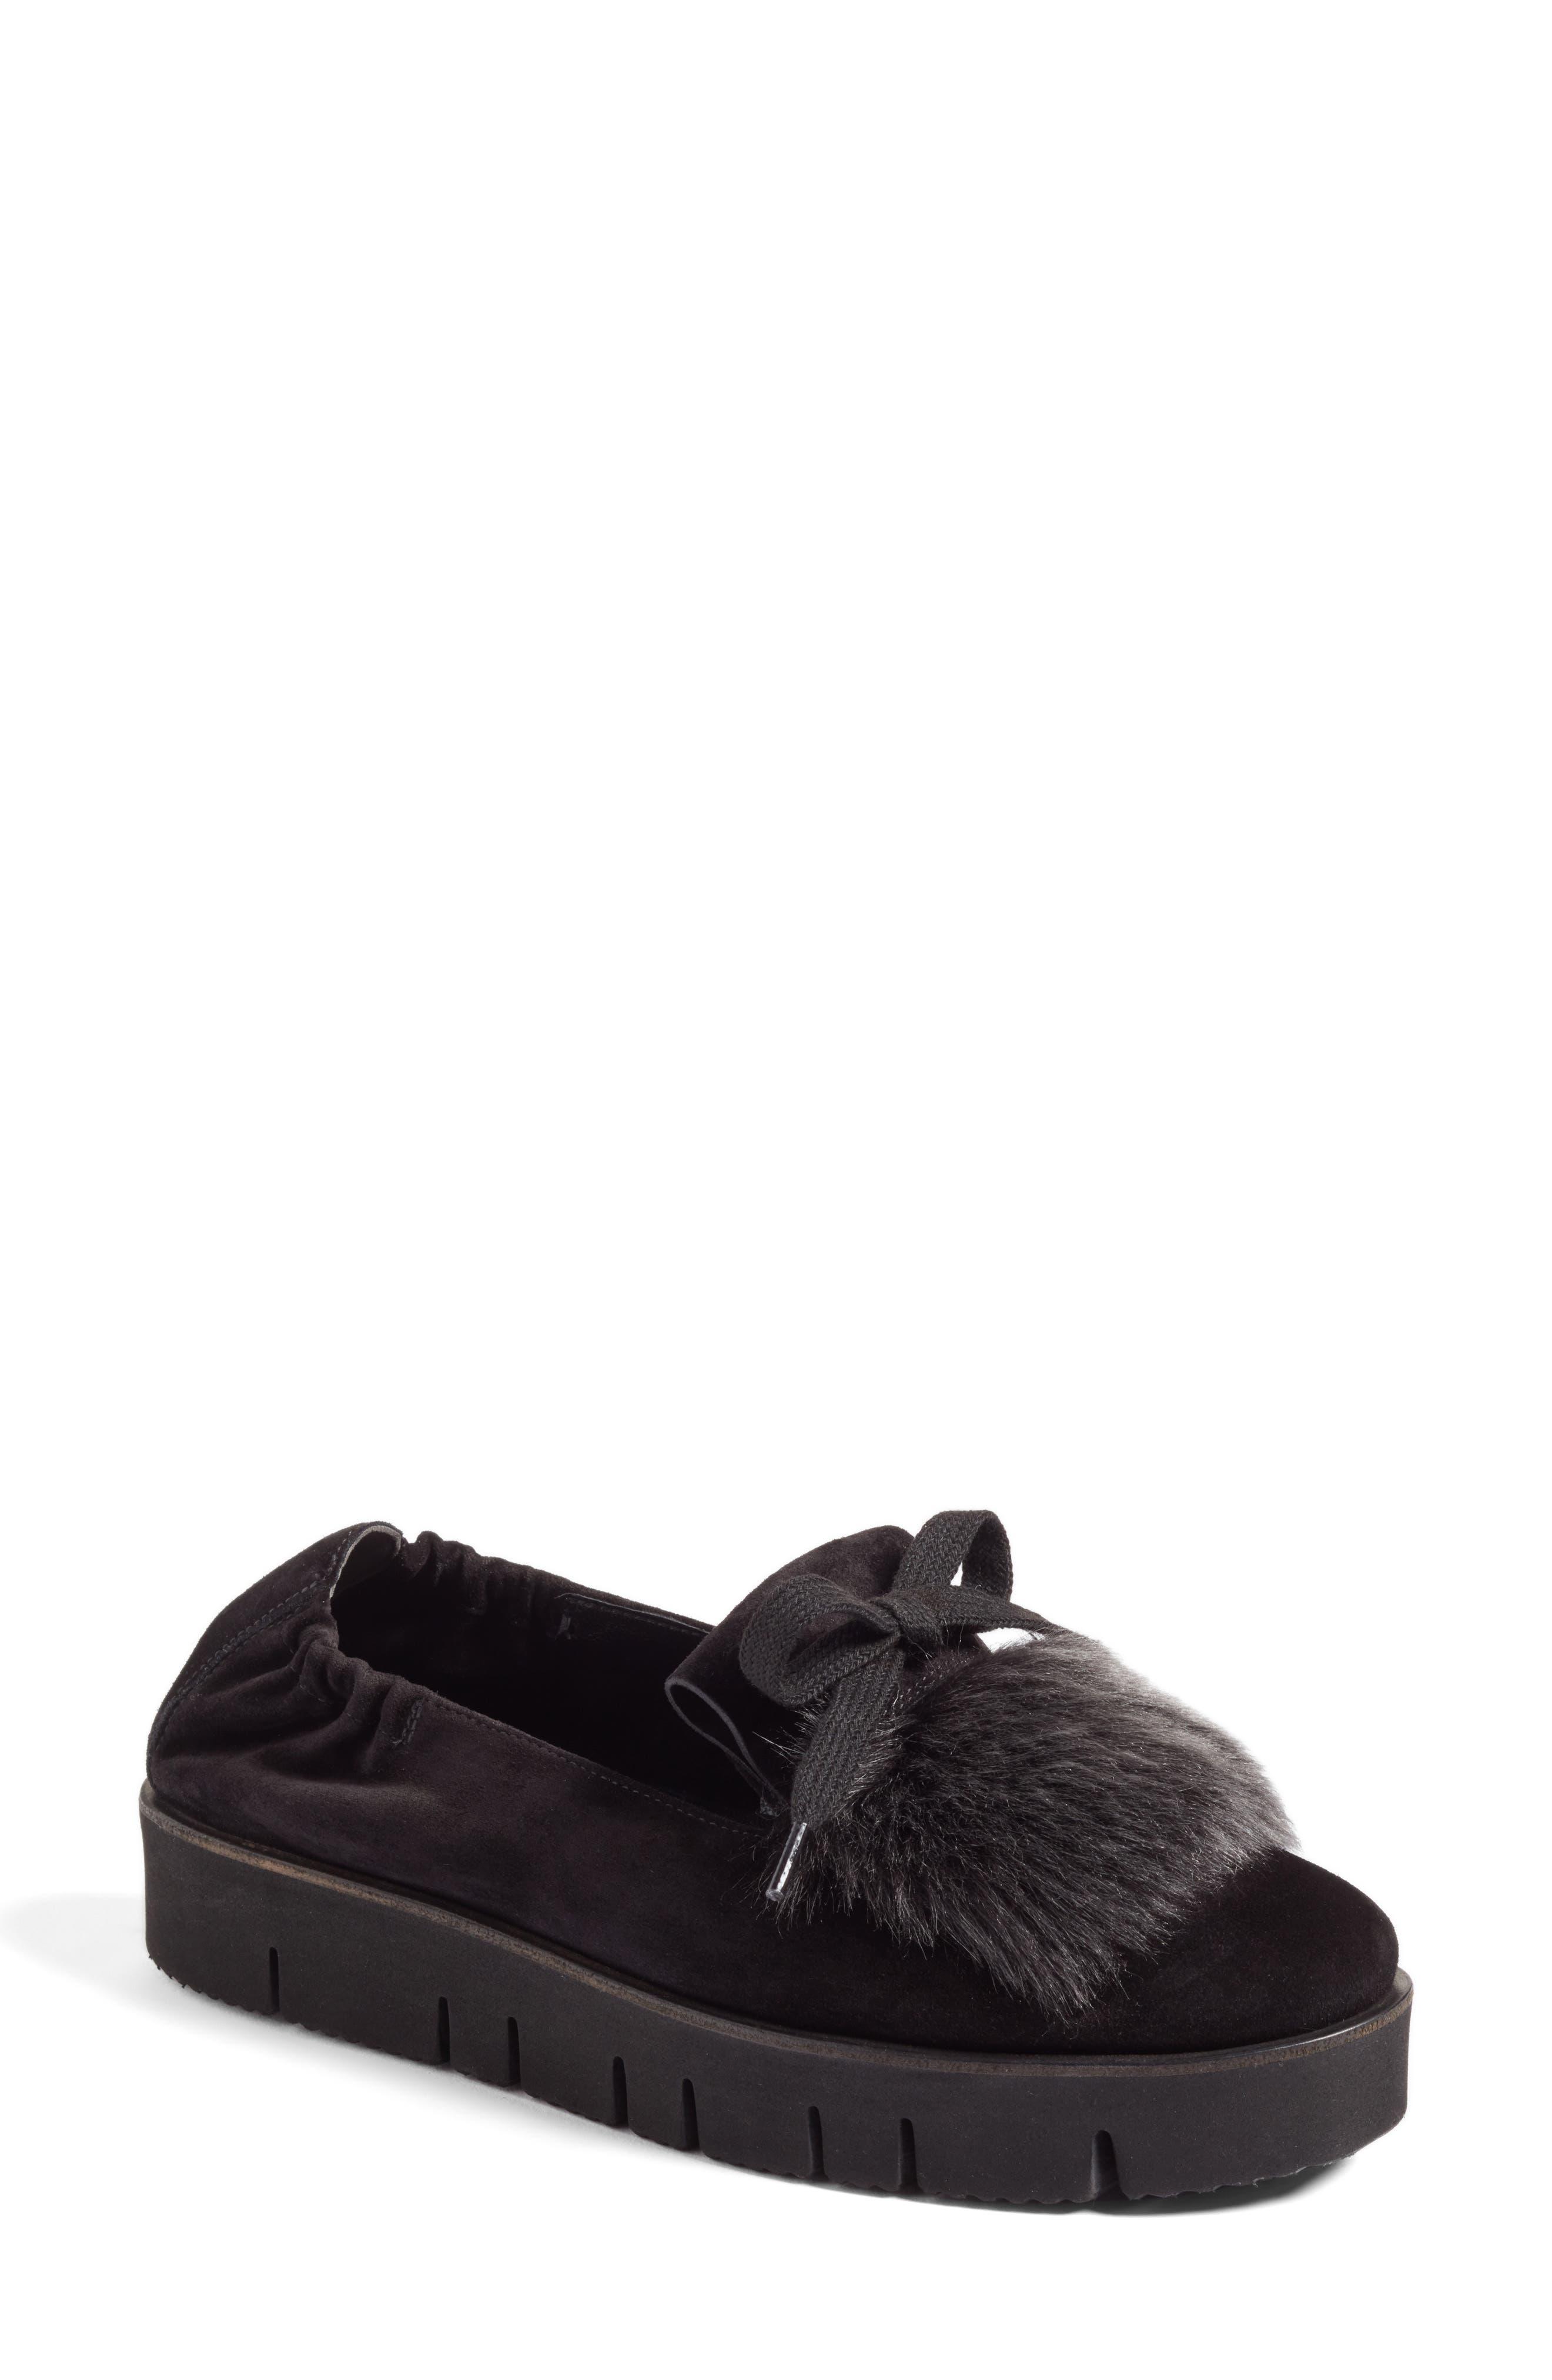 Kennel & Schmenger Malu Suede & Genuine Shearling Slip-On Sneaker,                             Main thumbnail 1, color,                             001